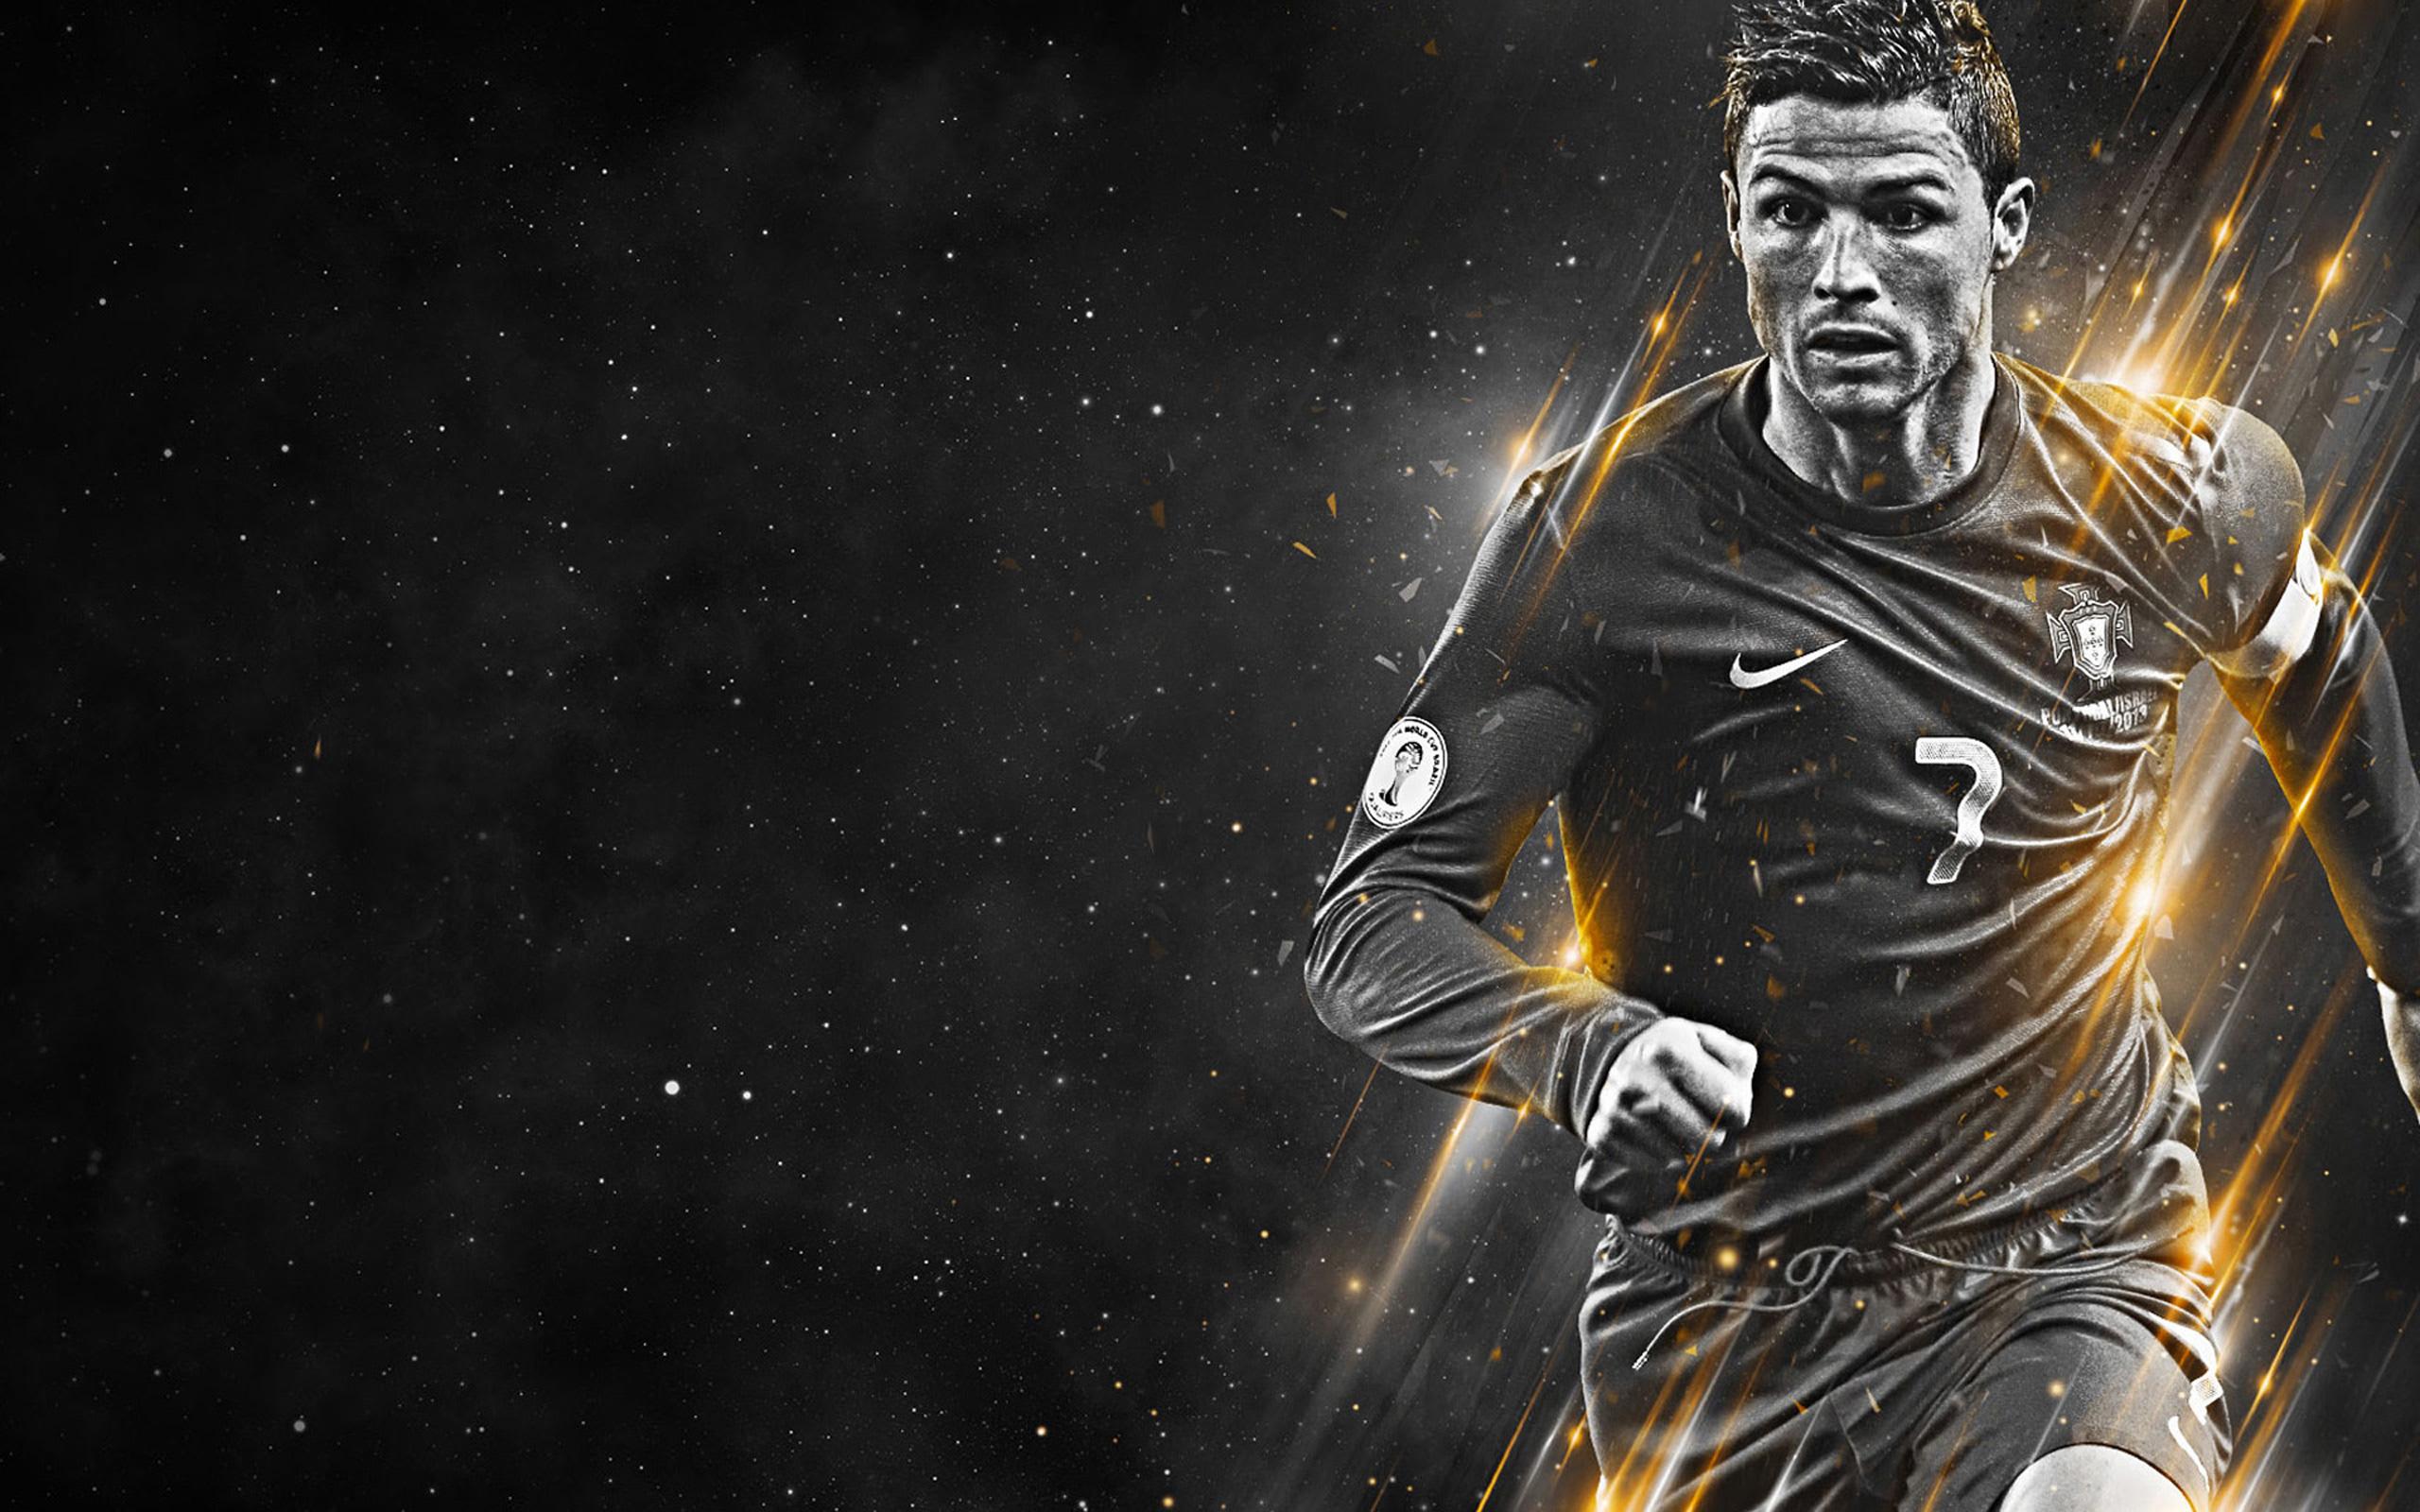 Ronaldo black and white wallpaper   Cristiano Ronaldo Wallpapers 2560x1600